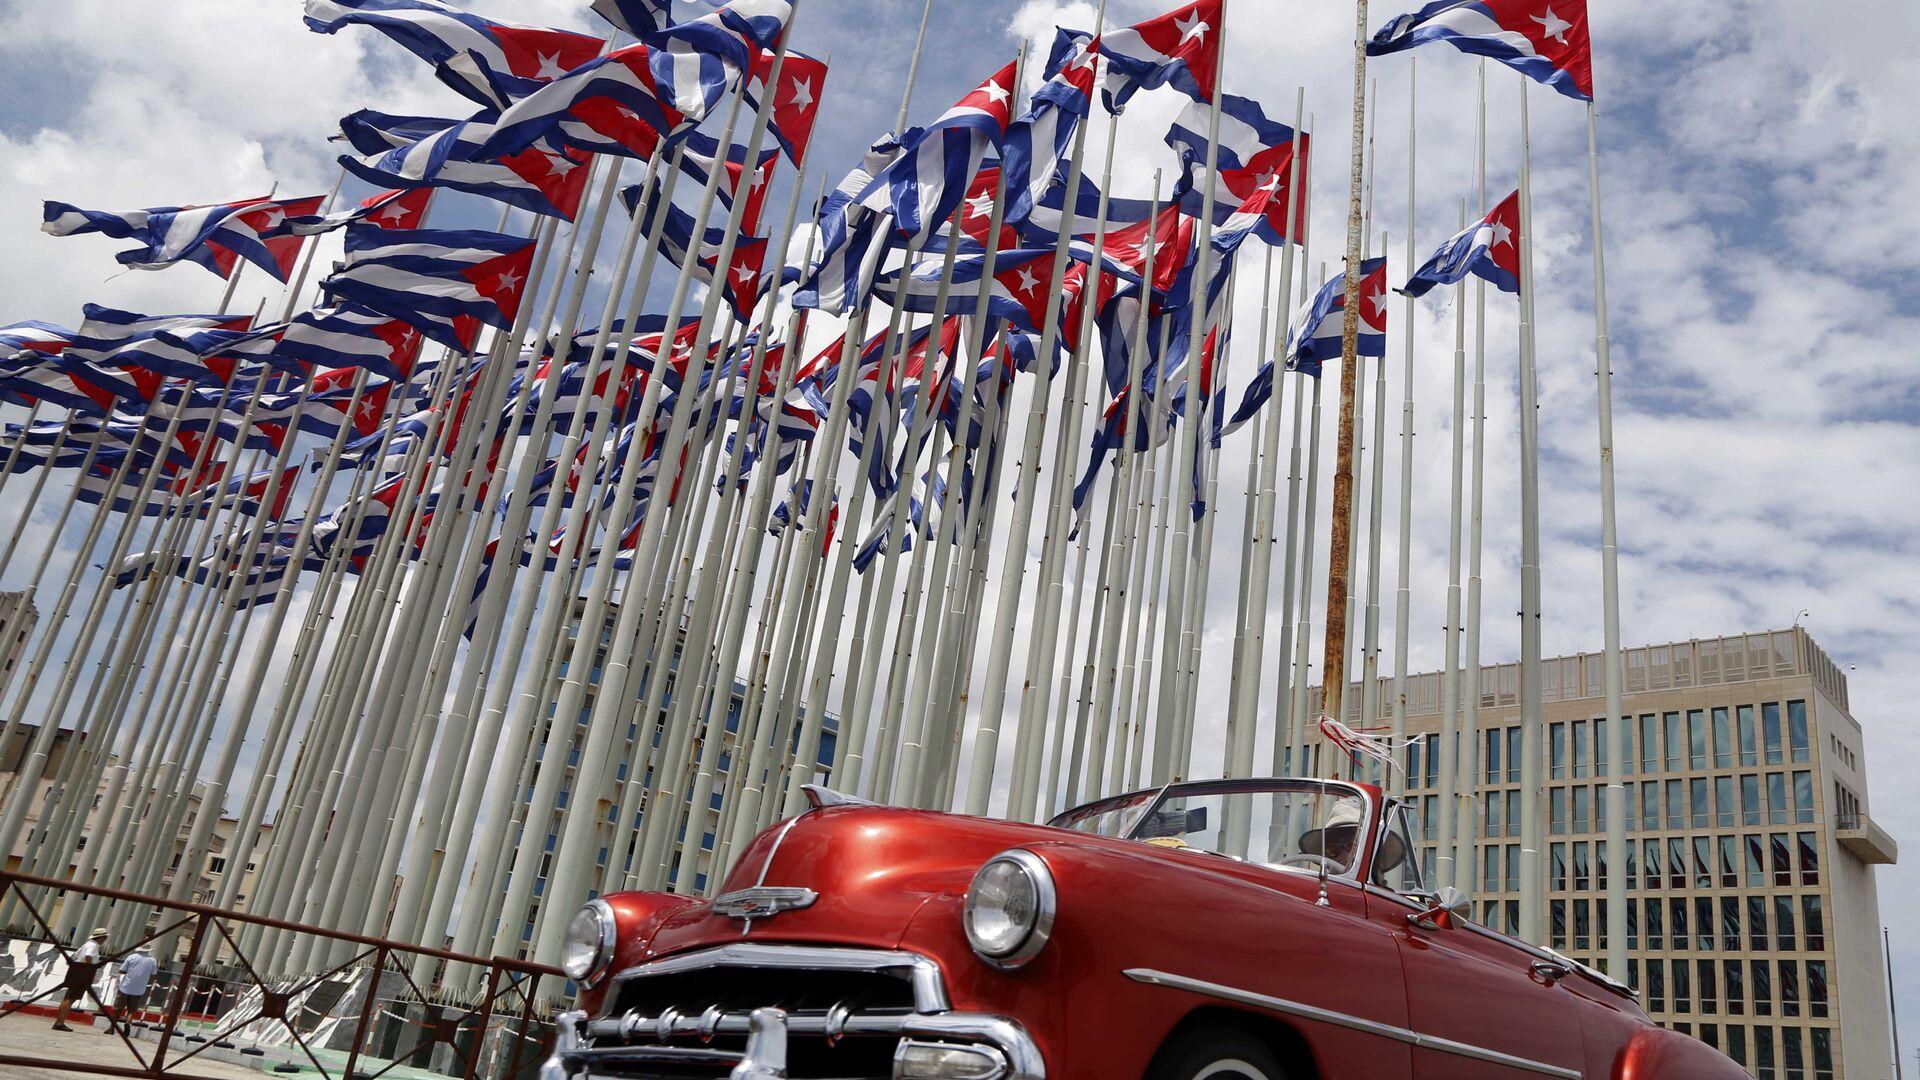 Tribuna antiimperialista en La Habana - Sputnik Mundo, 1920, 09.08.2021